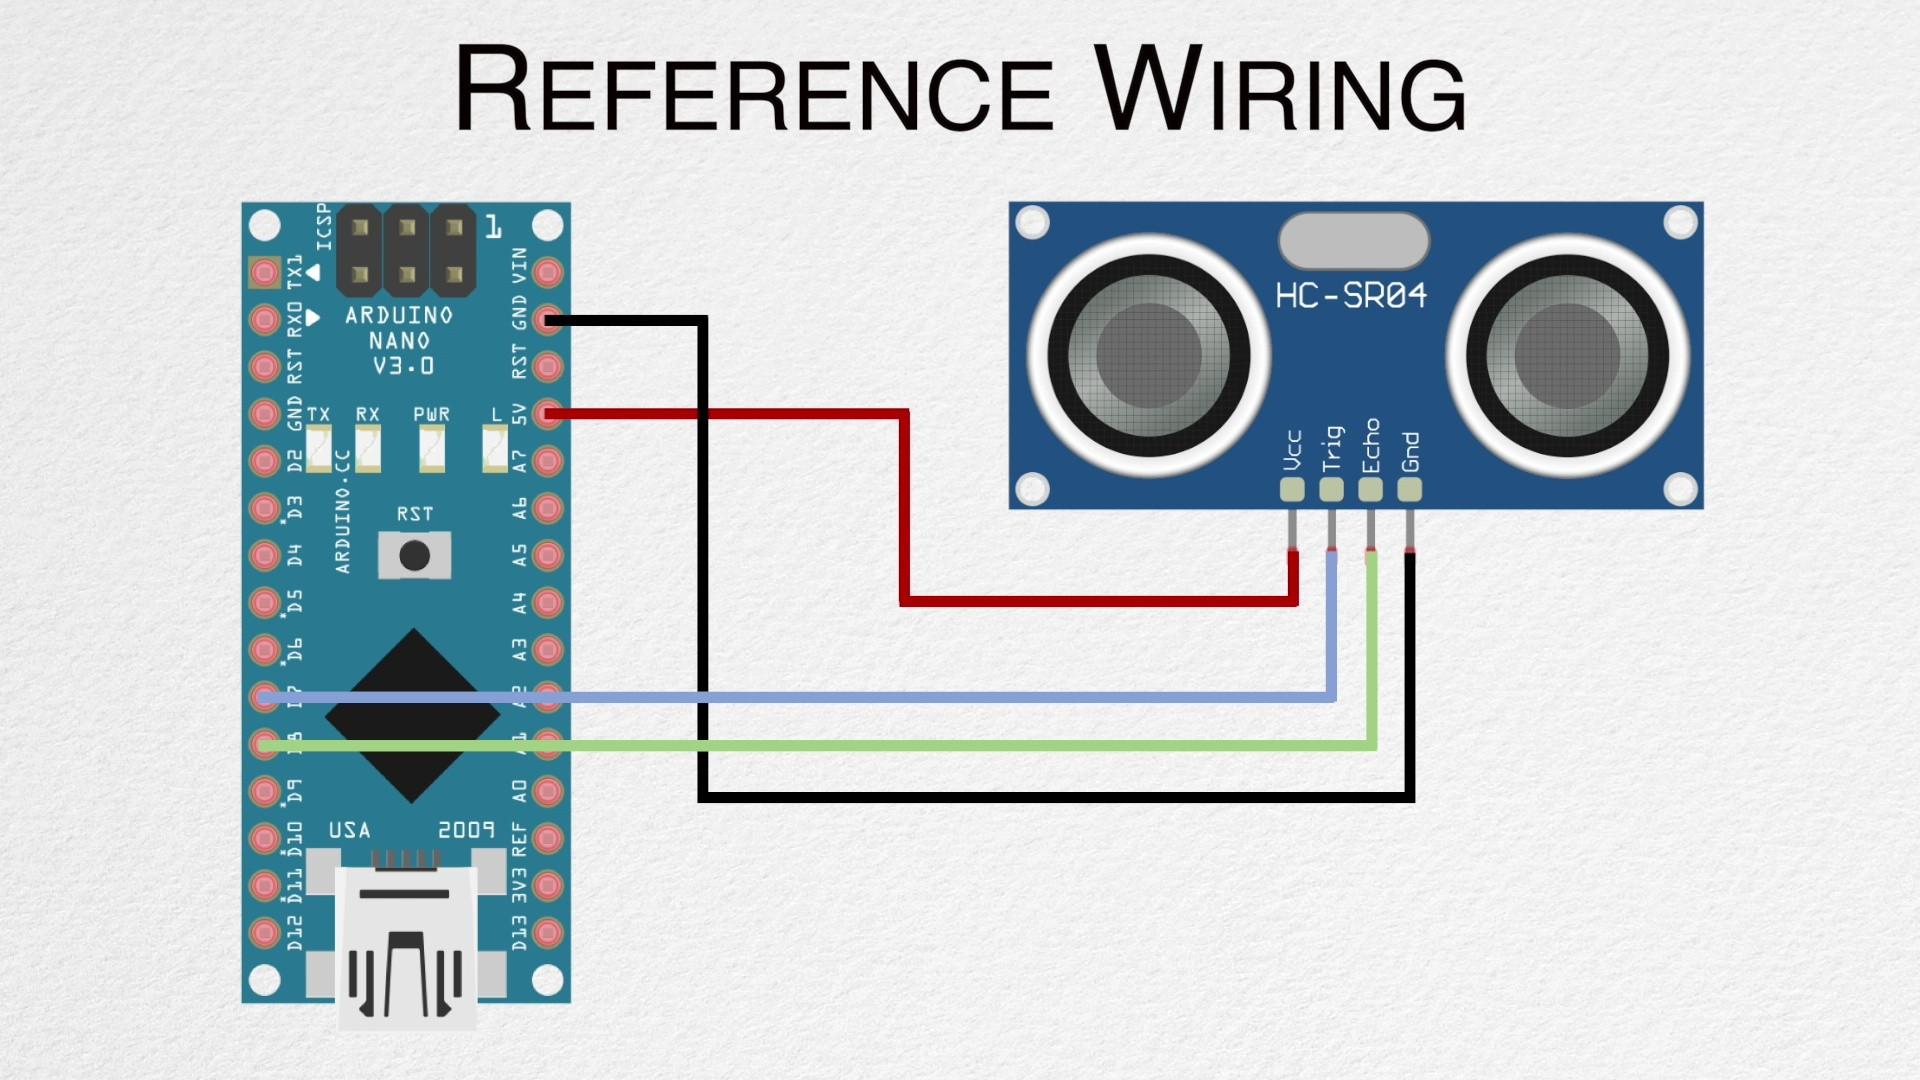 wiring BicS VwE5